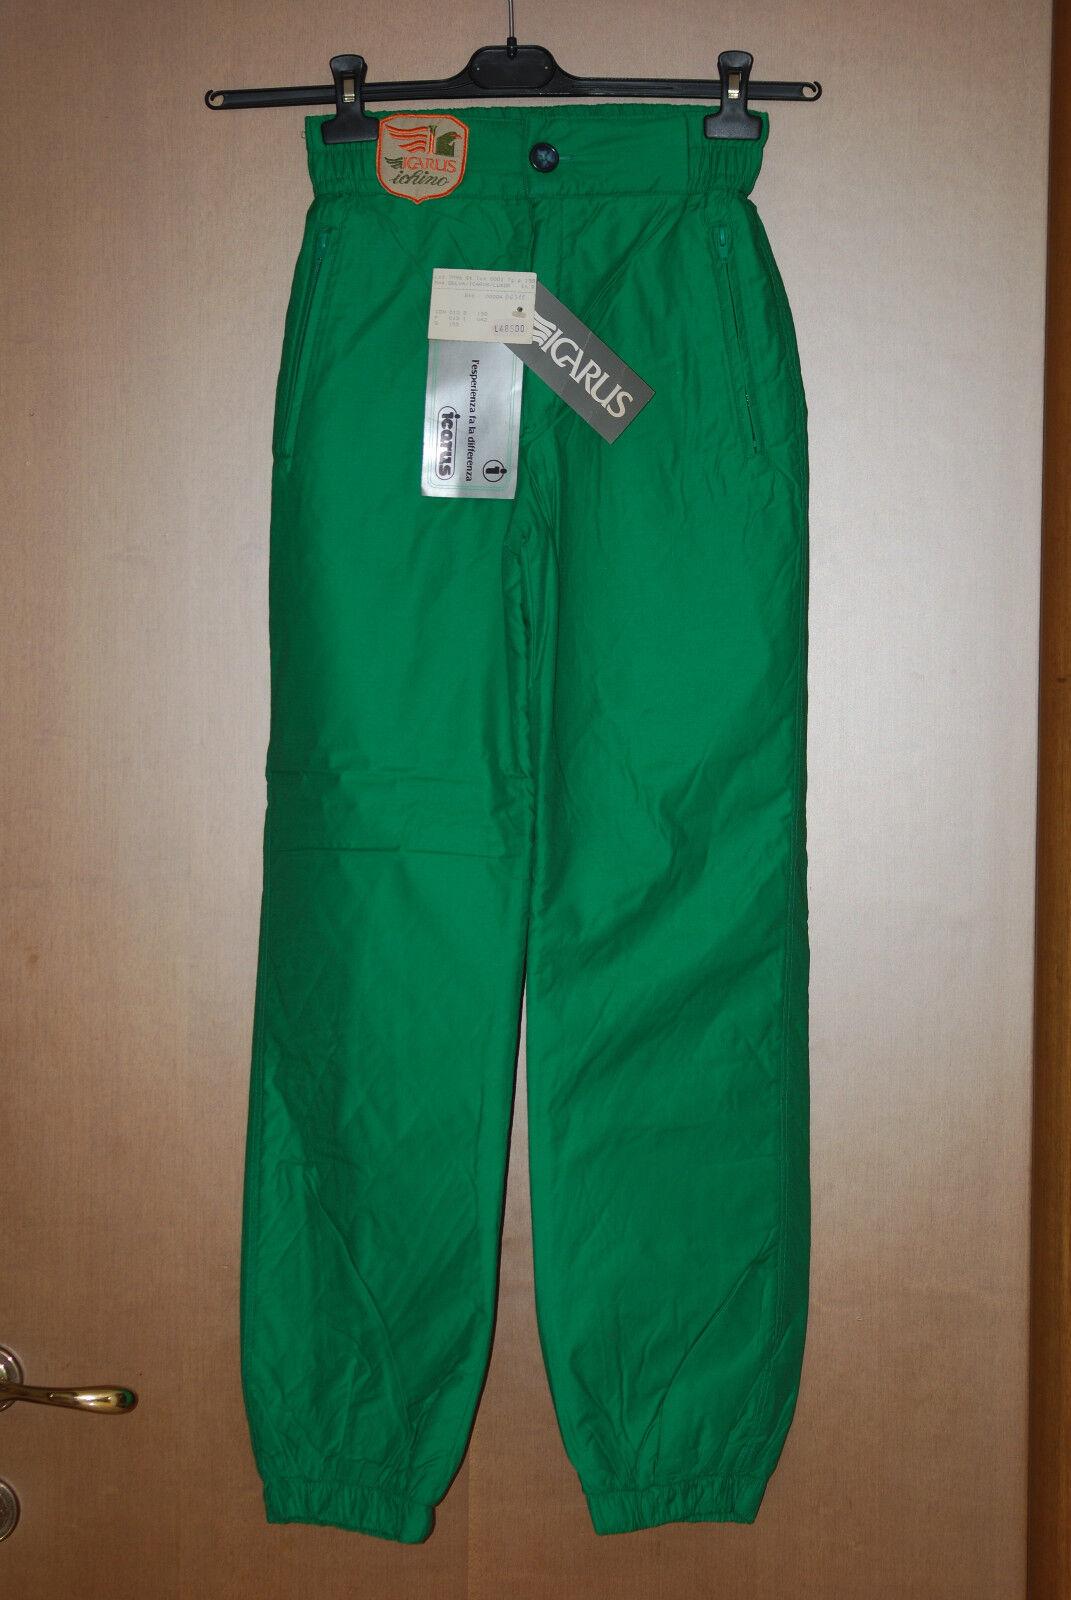 Pantalone ICocheUS suit NEW    vintage thermo sport snowTablero snow paninaro 46  mejor oferta